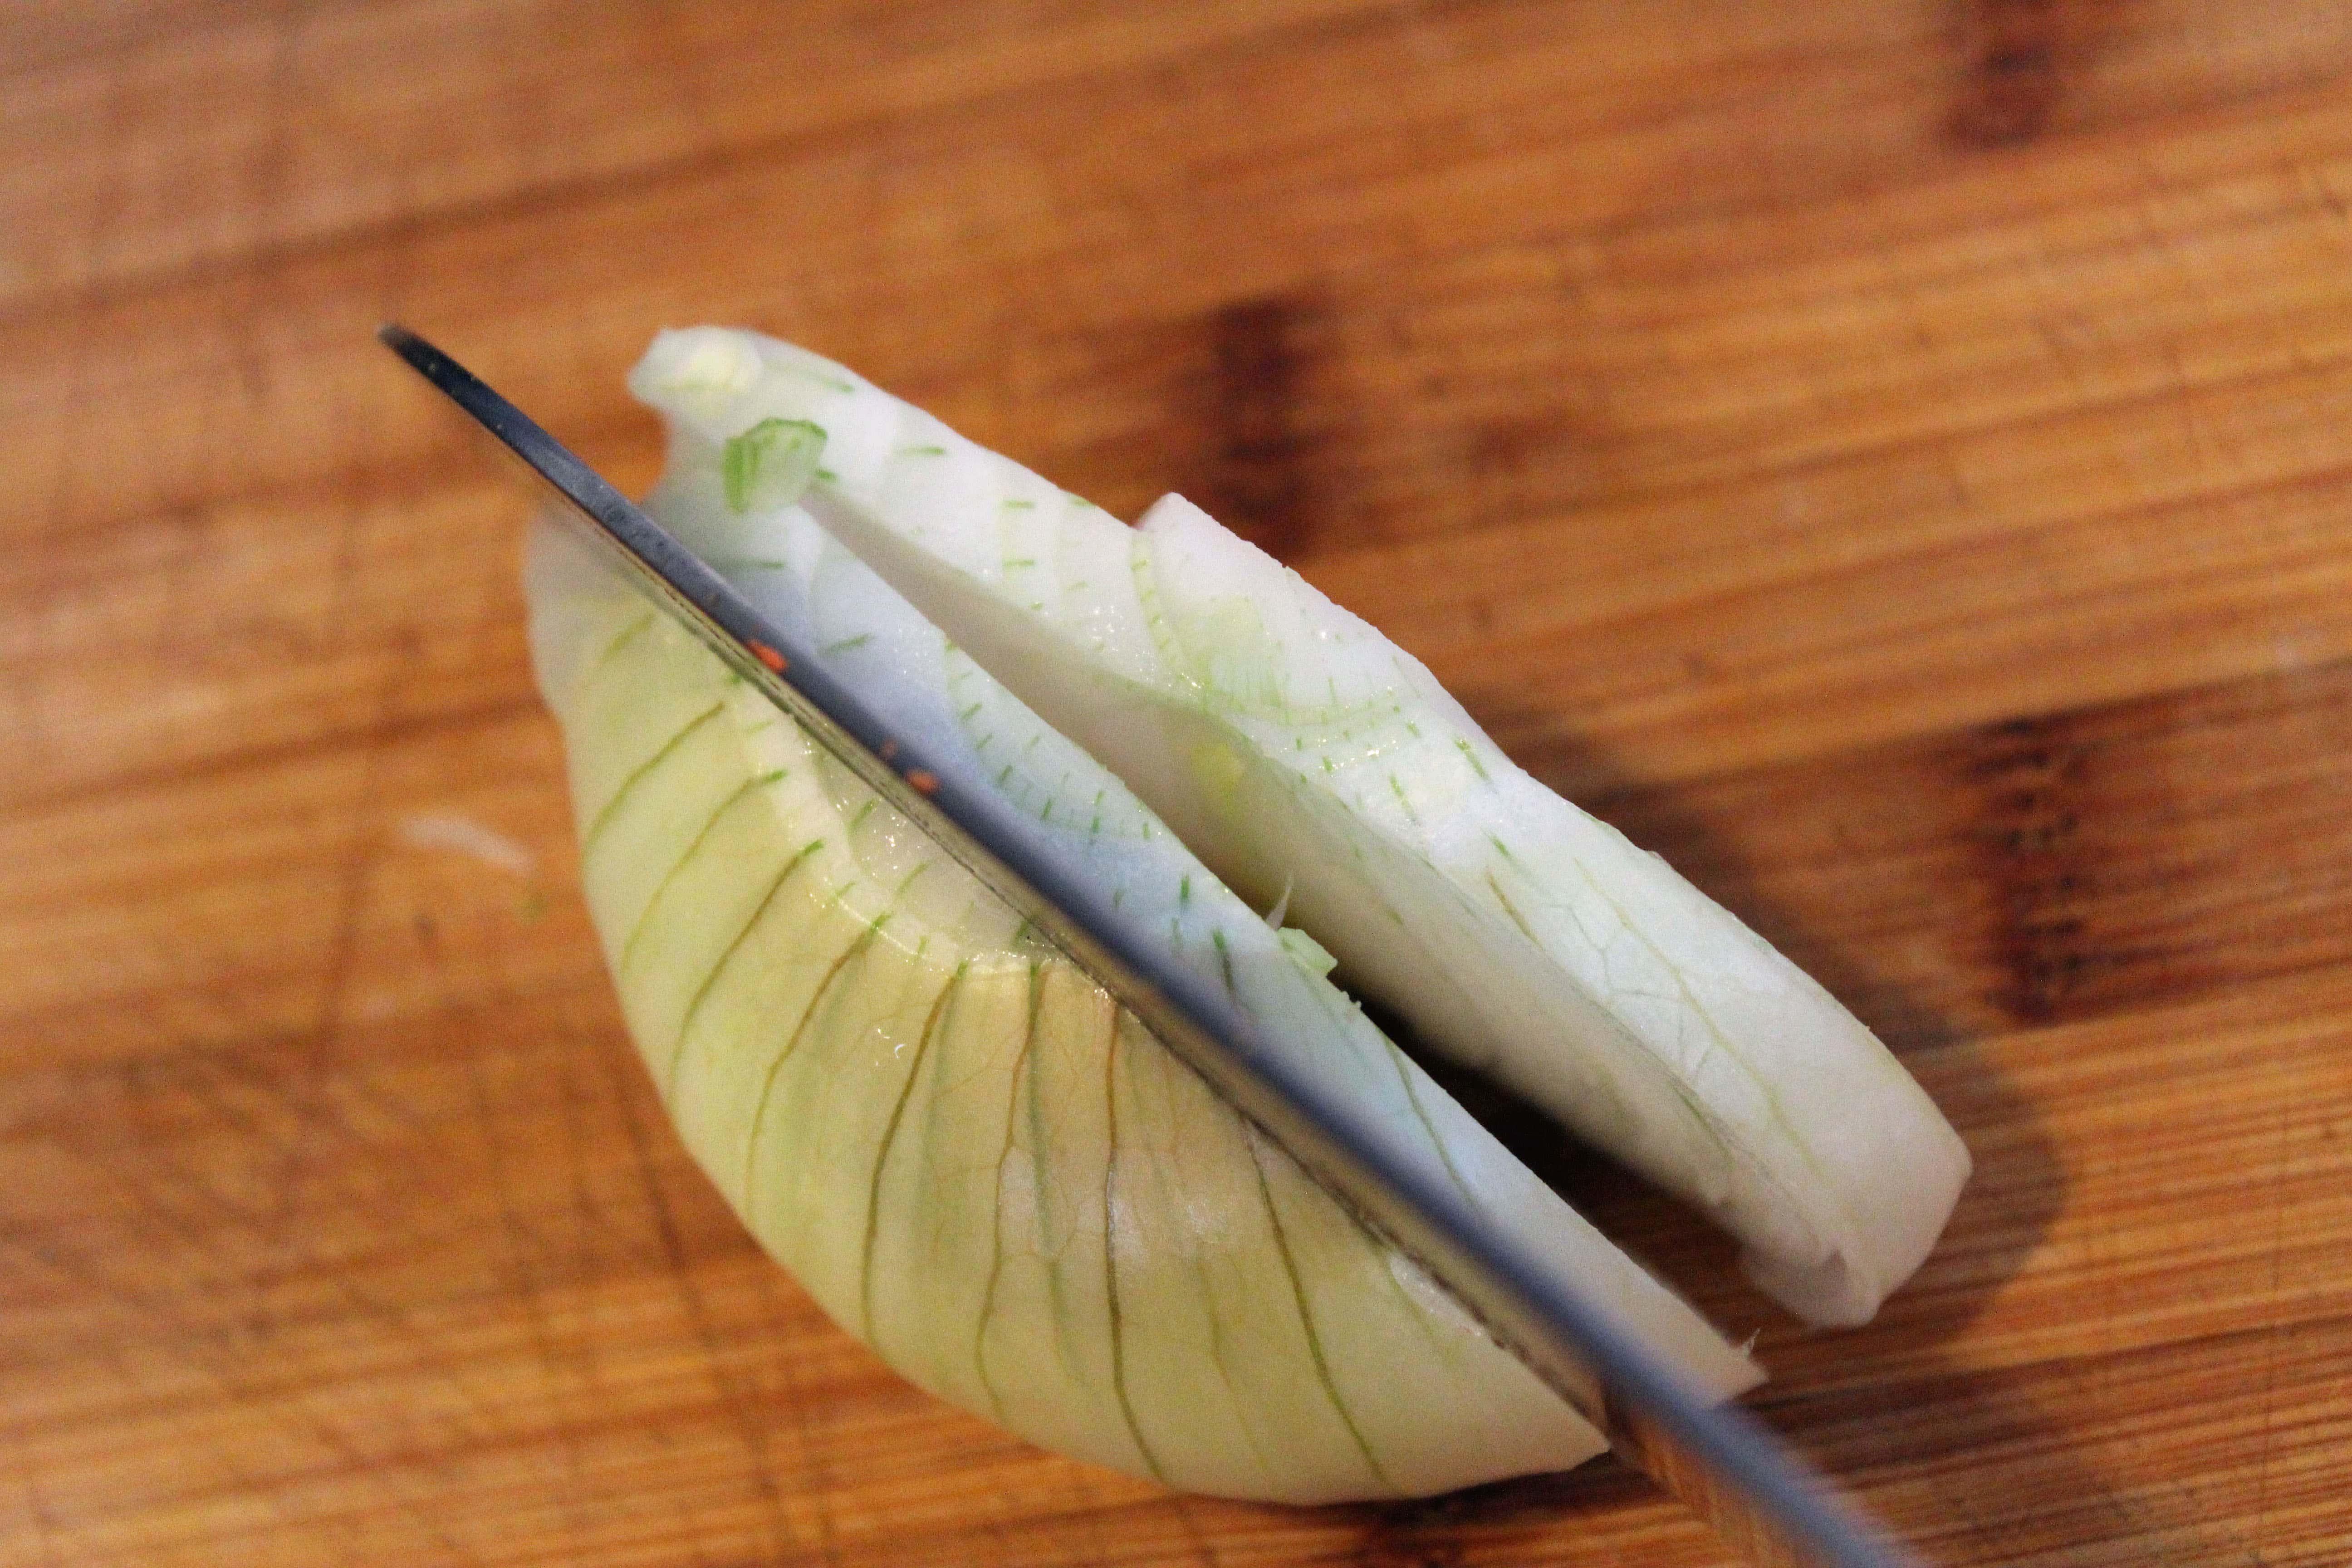 Cut onion half into planks